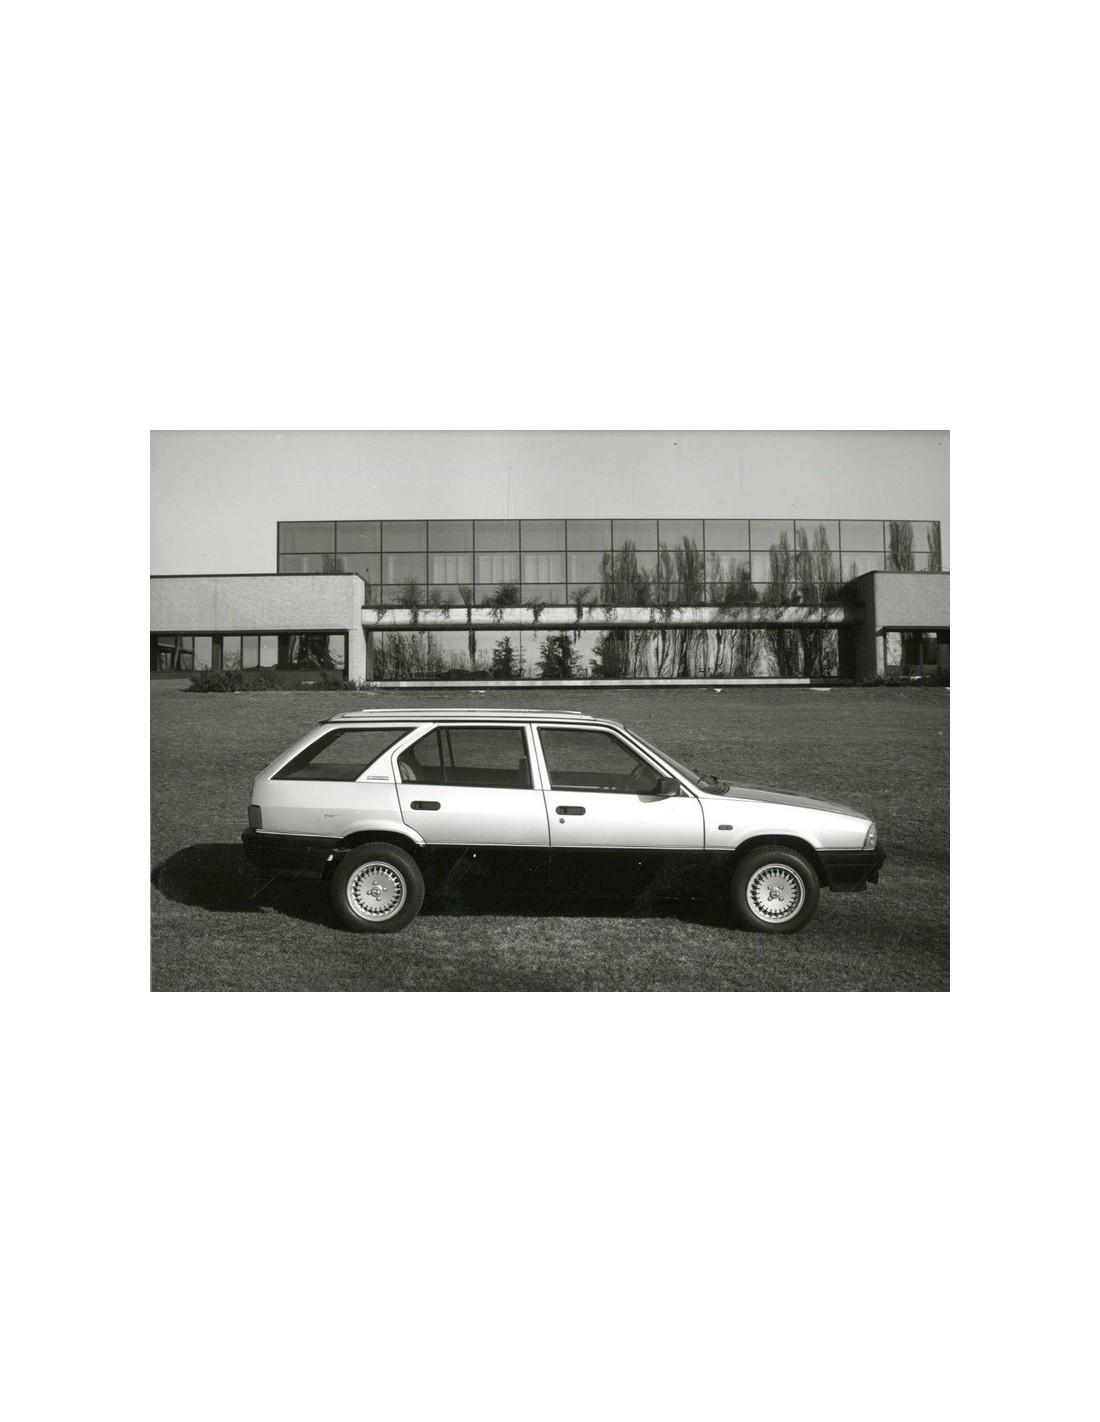 1984 alfa romeo 33 4x4 giardinetta press photo. Black Bedroom Furniture Sets. Home Design Ideas